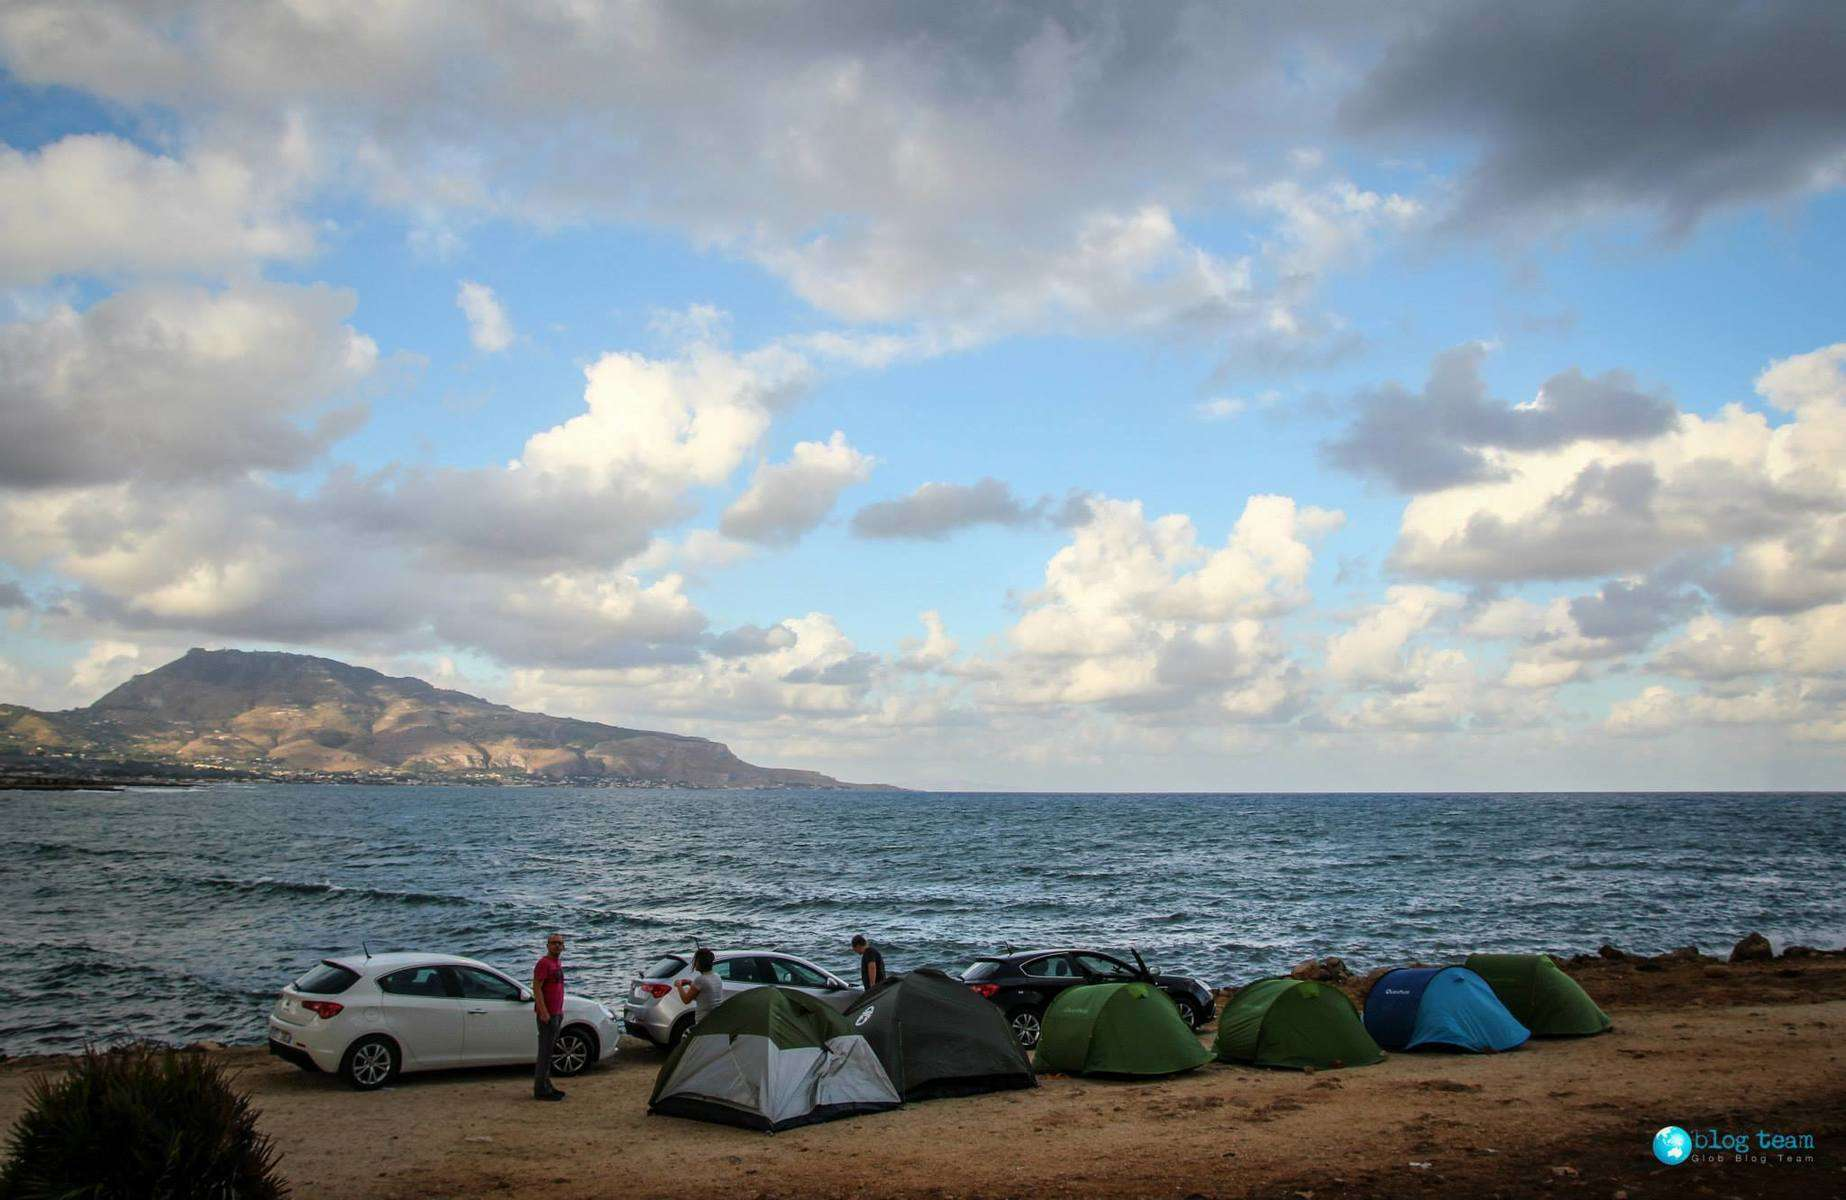 Spanie na dziko na Sycylii